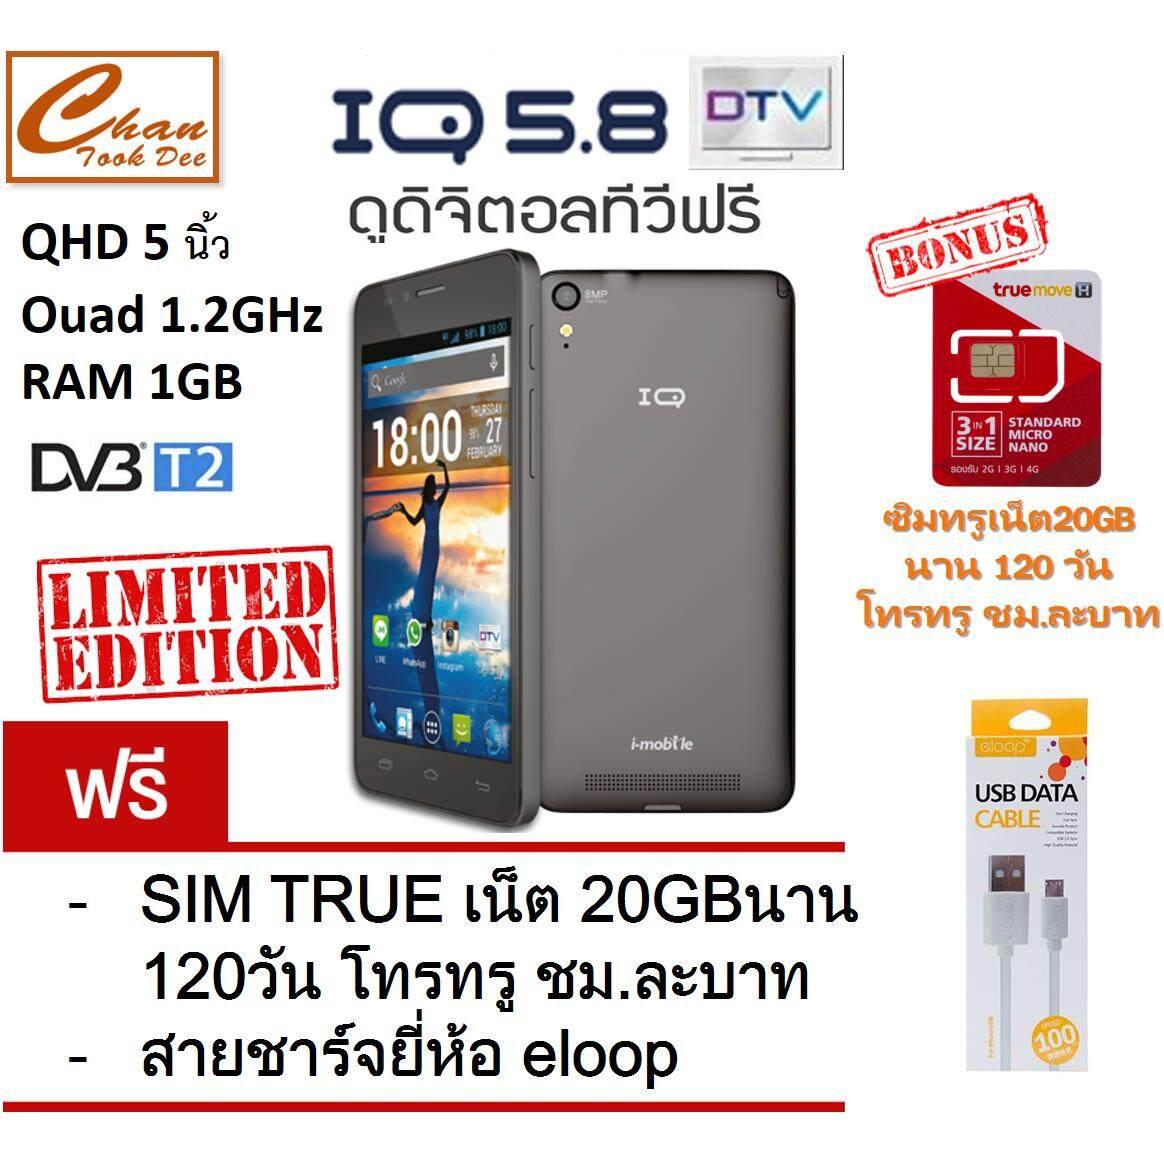 i-mobile IQ 5.8 DTV (BLACK) ฟรี สายชาร์จ ยี่ห้อ eloop + ซิมทรูเน็ต20GB นาน 120 วัน โทรทรู ชม.ละบาท